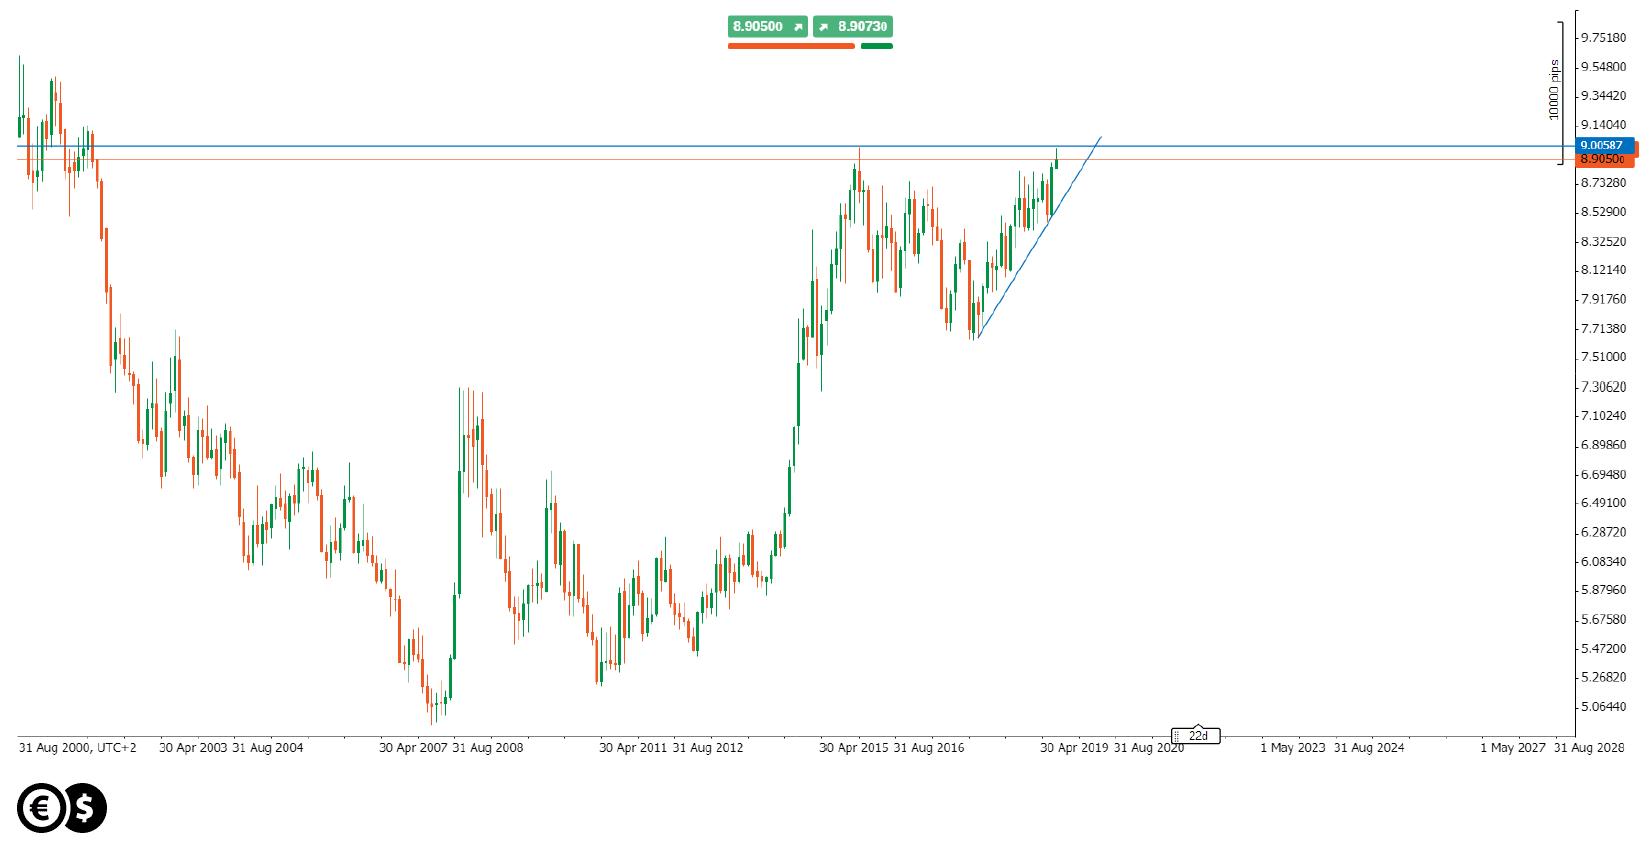 USD/NOK monthly chart